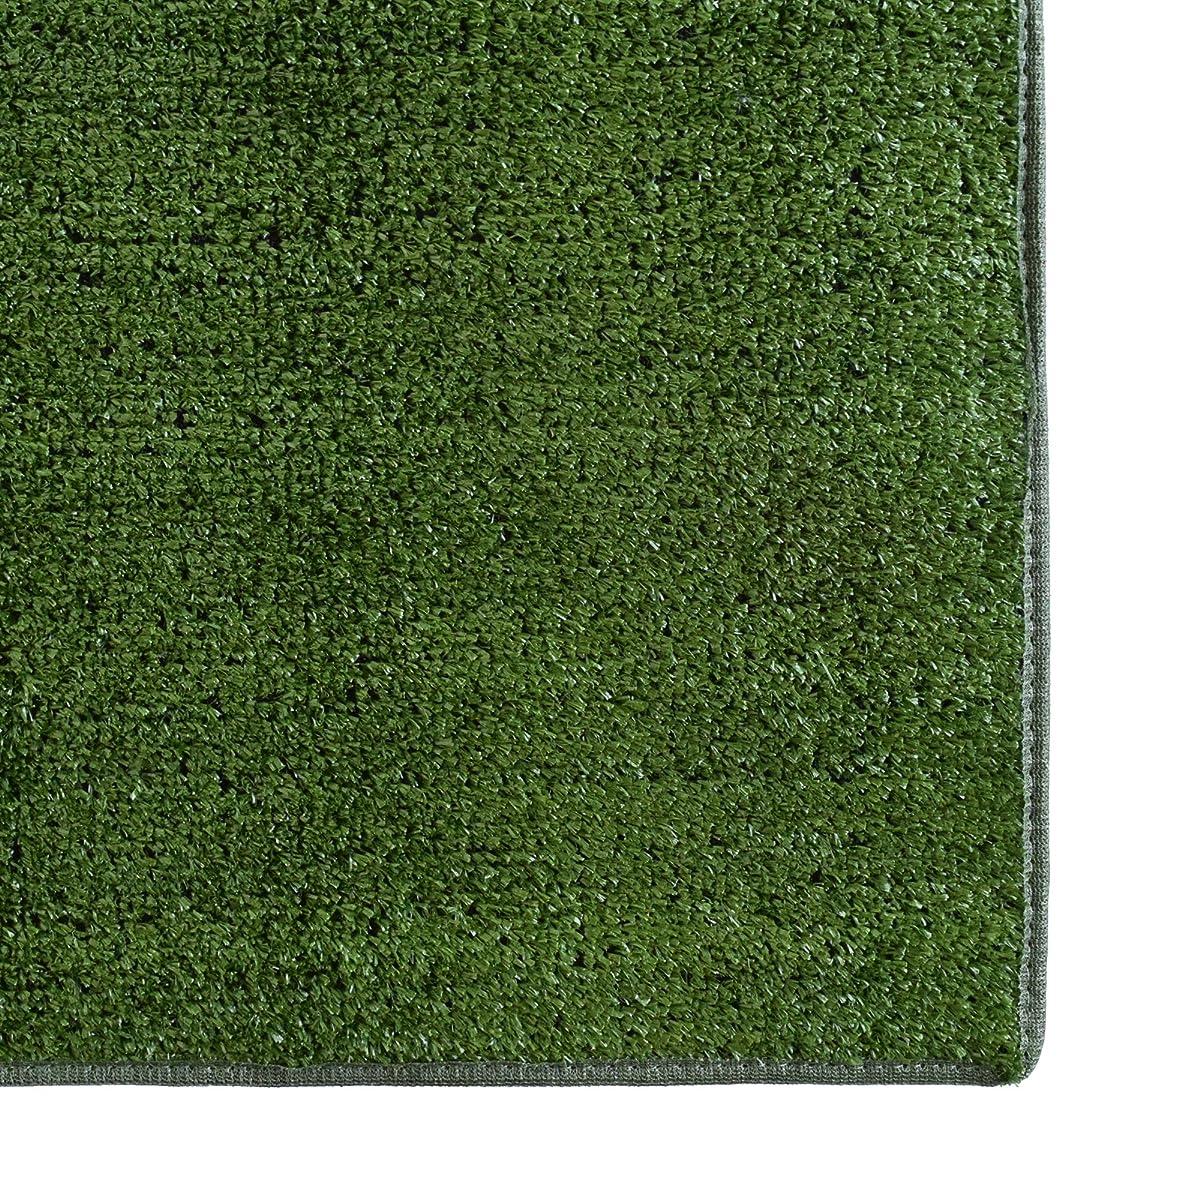 ICustomRug Outdoor Turf Rug In Green Artificial Grass In